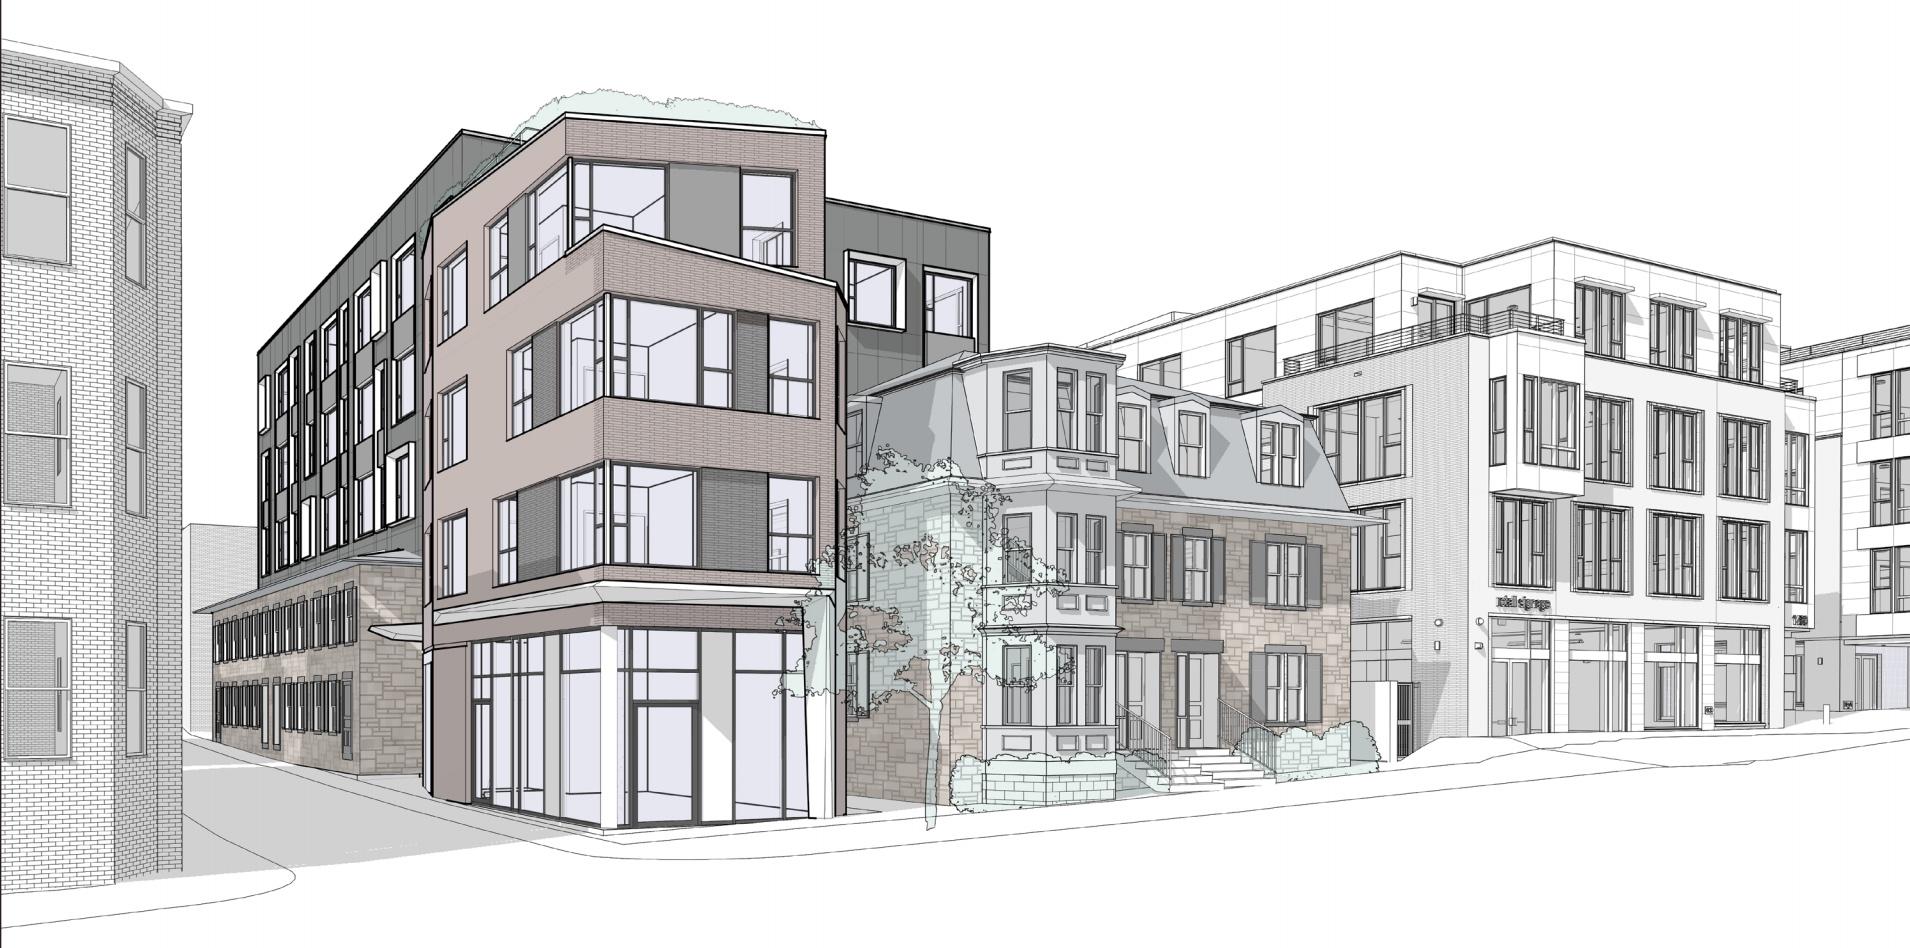 1470 tremont street savage properties residential retail mixed use development mission hill roxbury mbta orange line architect hacin associates rendering 2